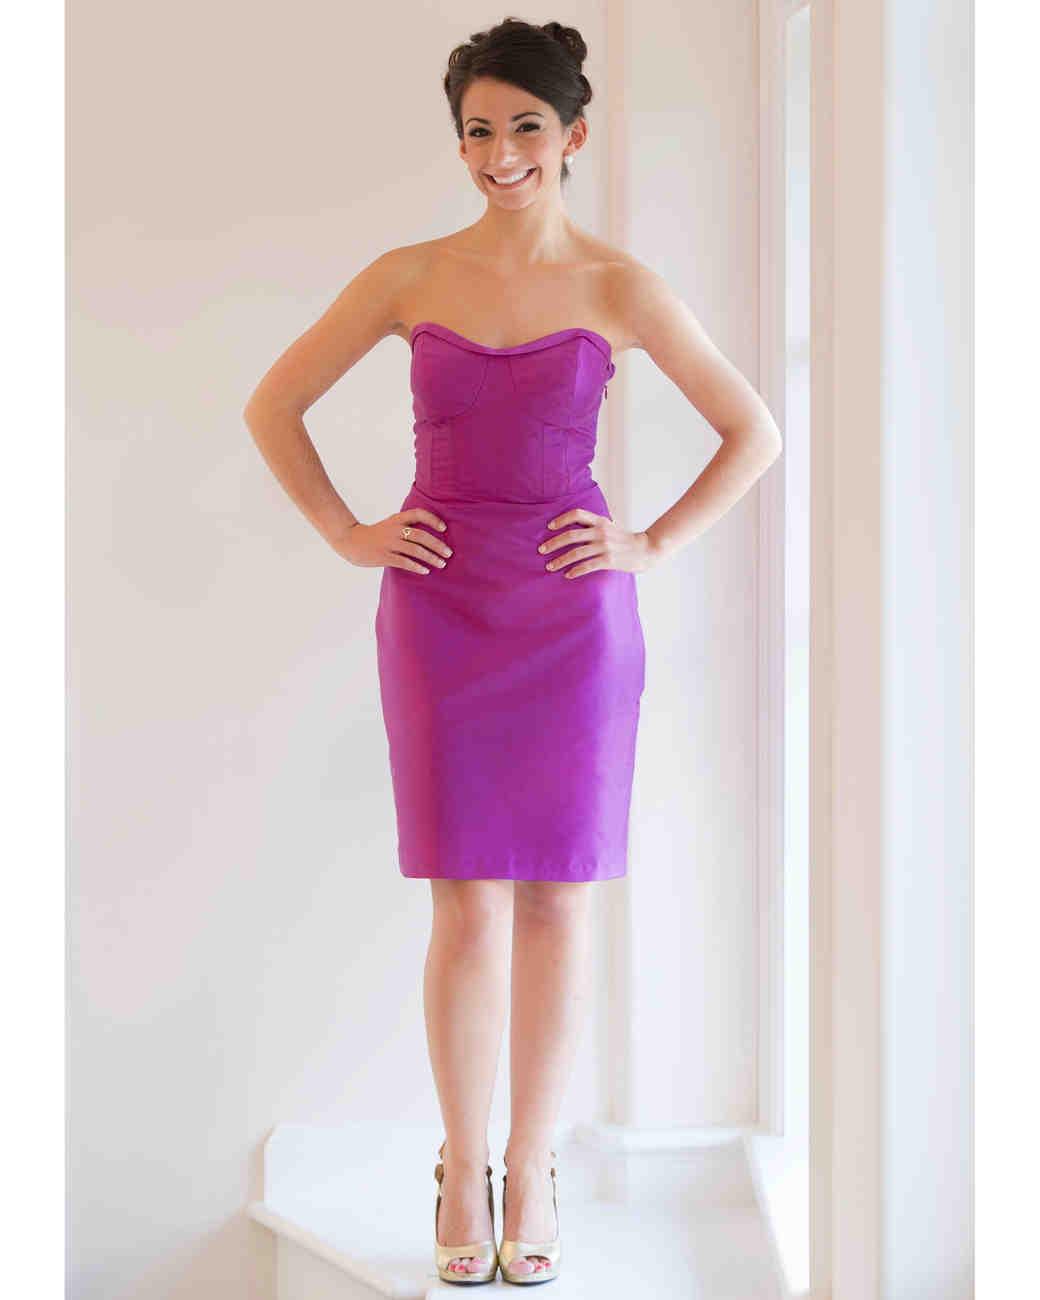 Fashion design images – Page 282 – Fashion Trends,Fashion Clothes ...